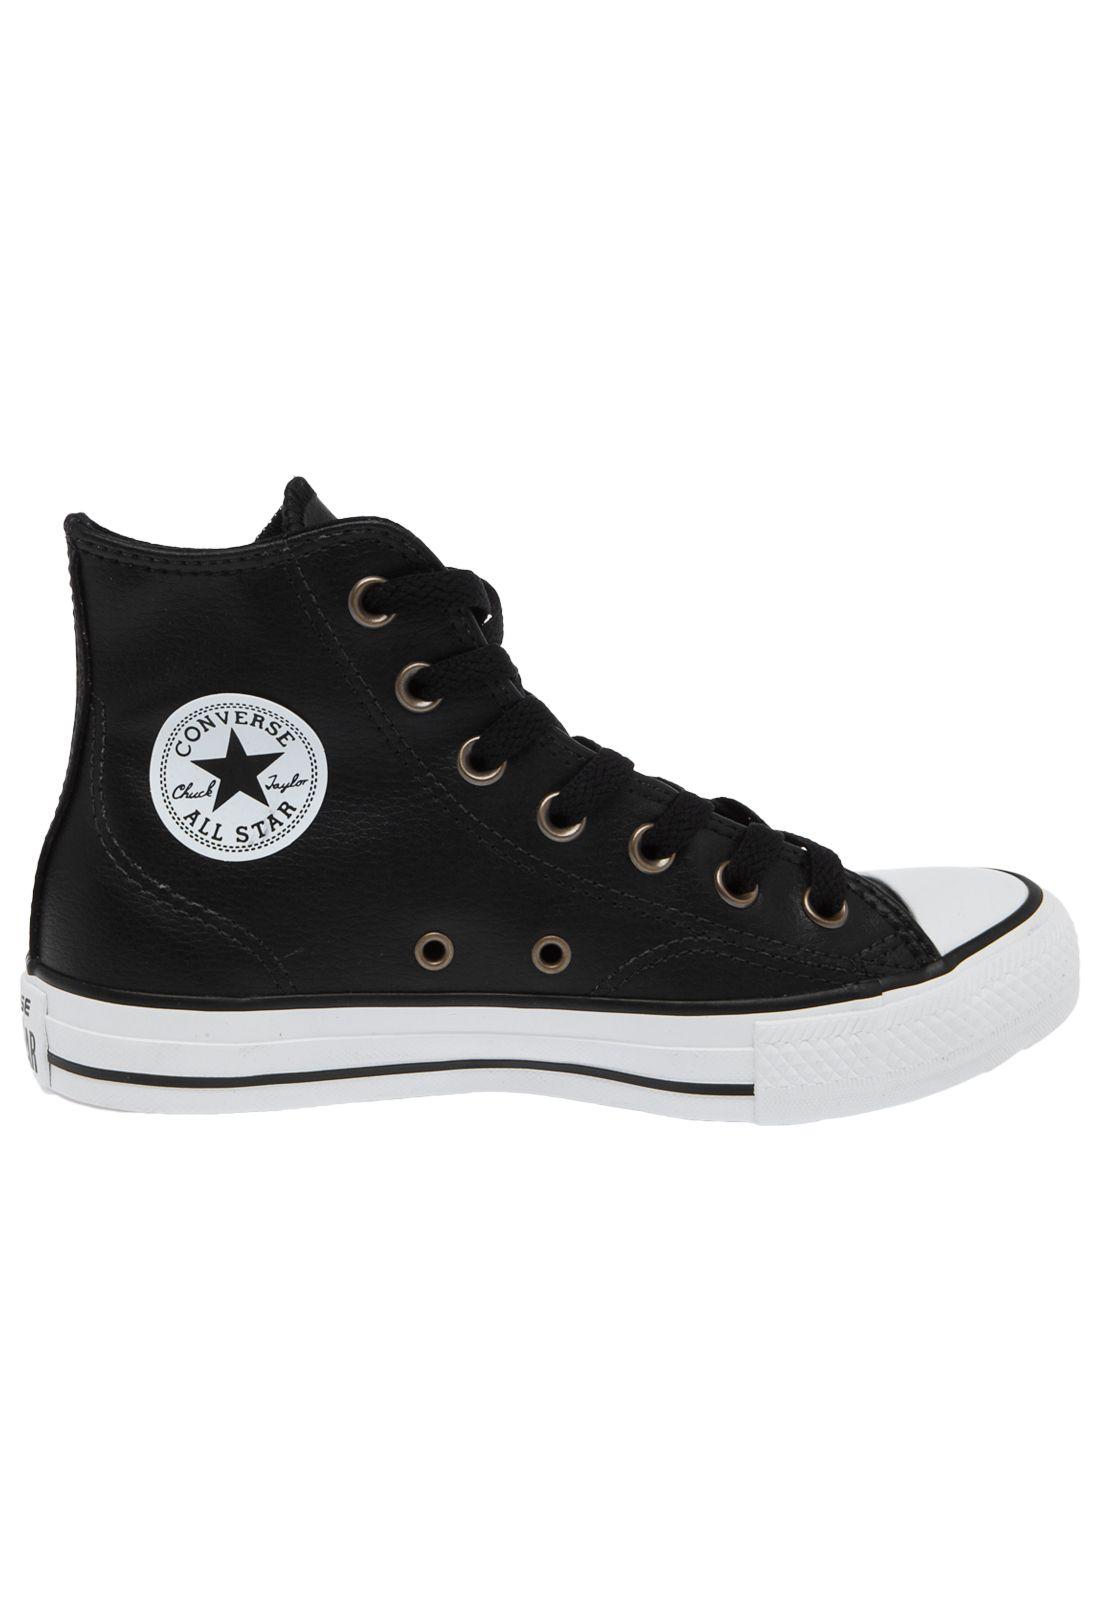 all star converse monocrome em lona todo preto